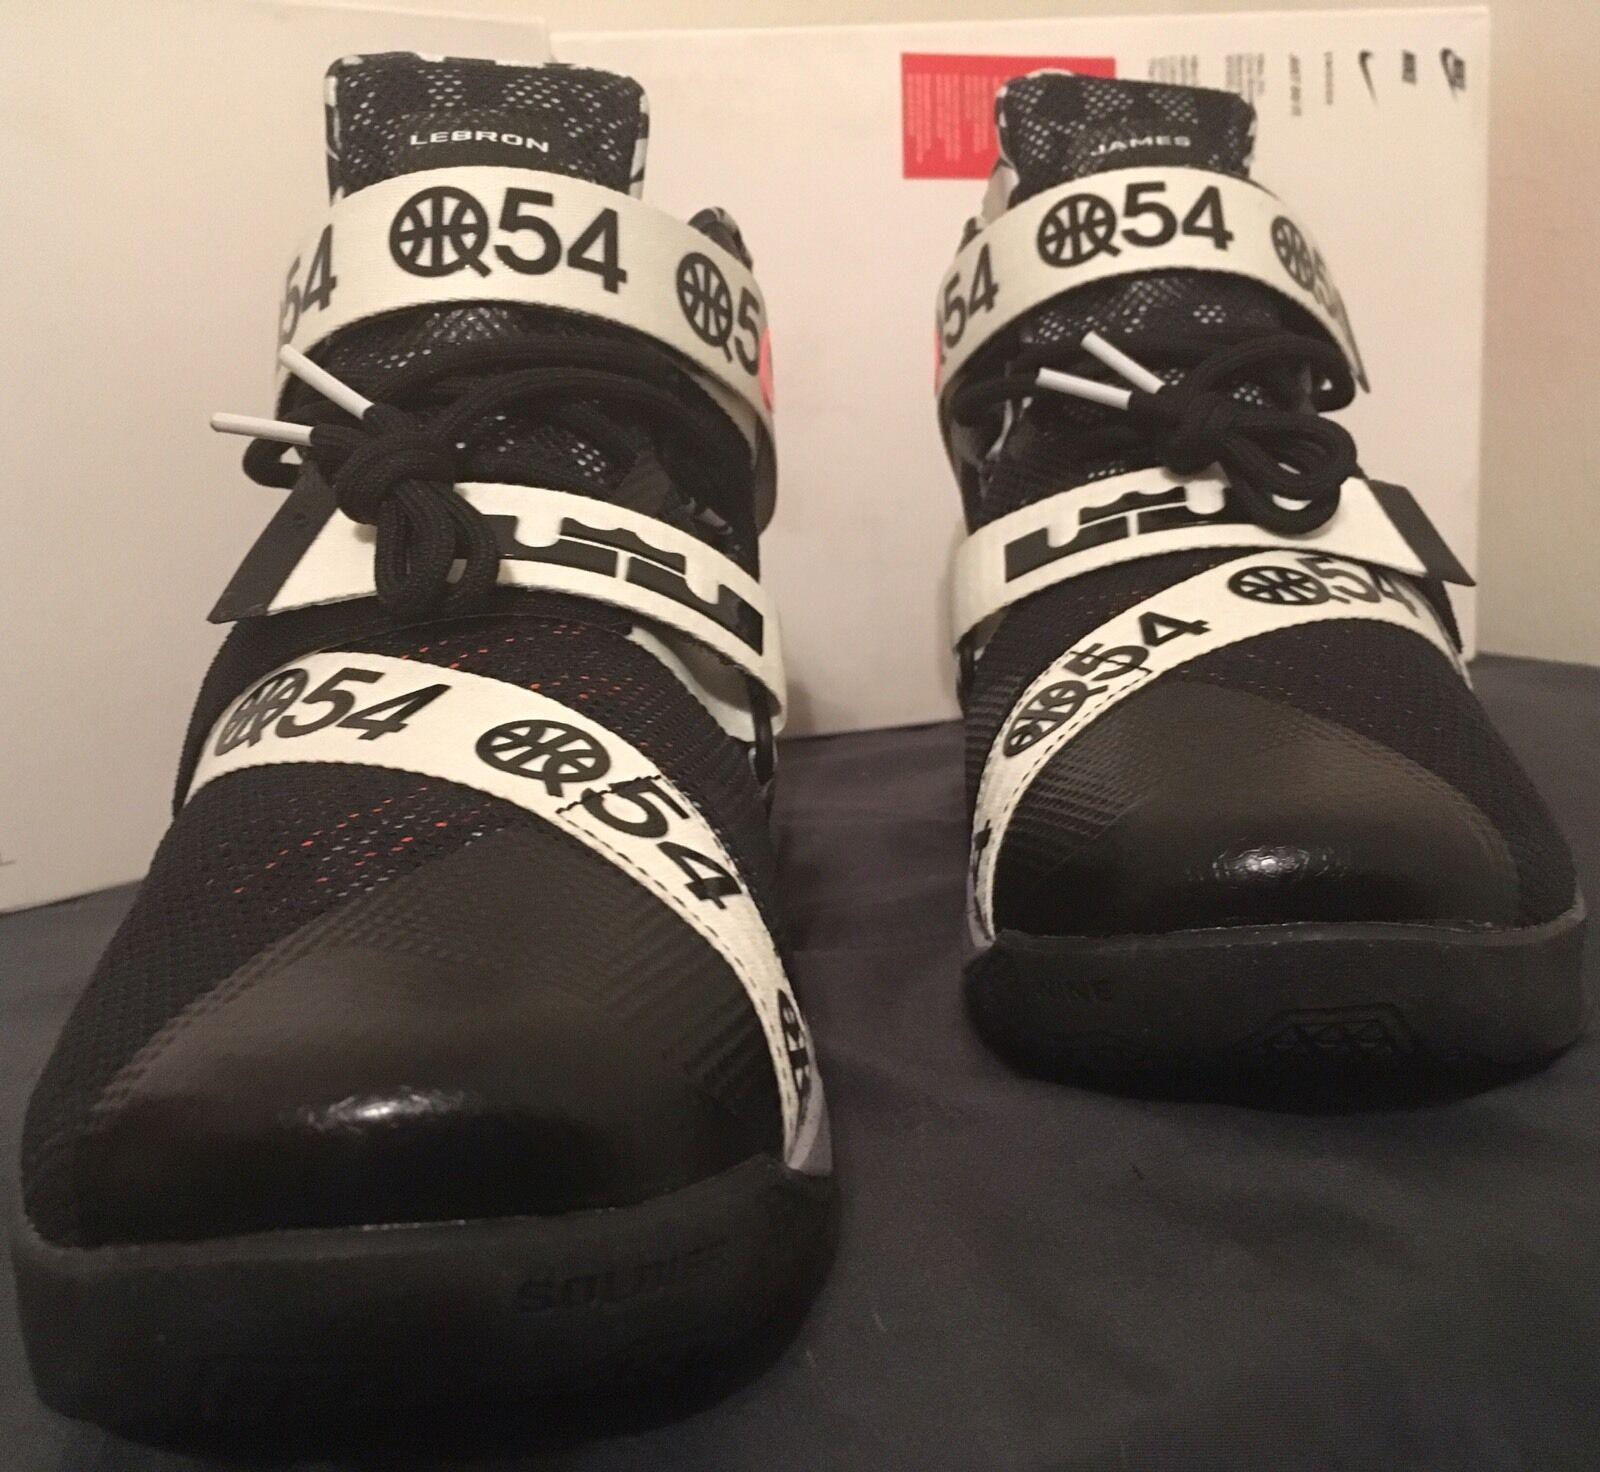 Nike lebron soldato ix lmtd 810803-015 quai 54 nero / bianco